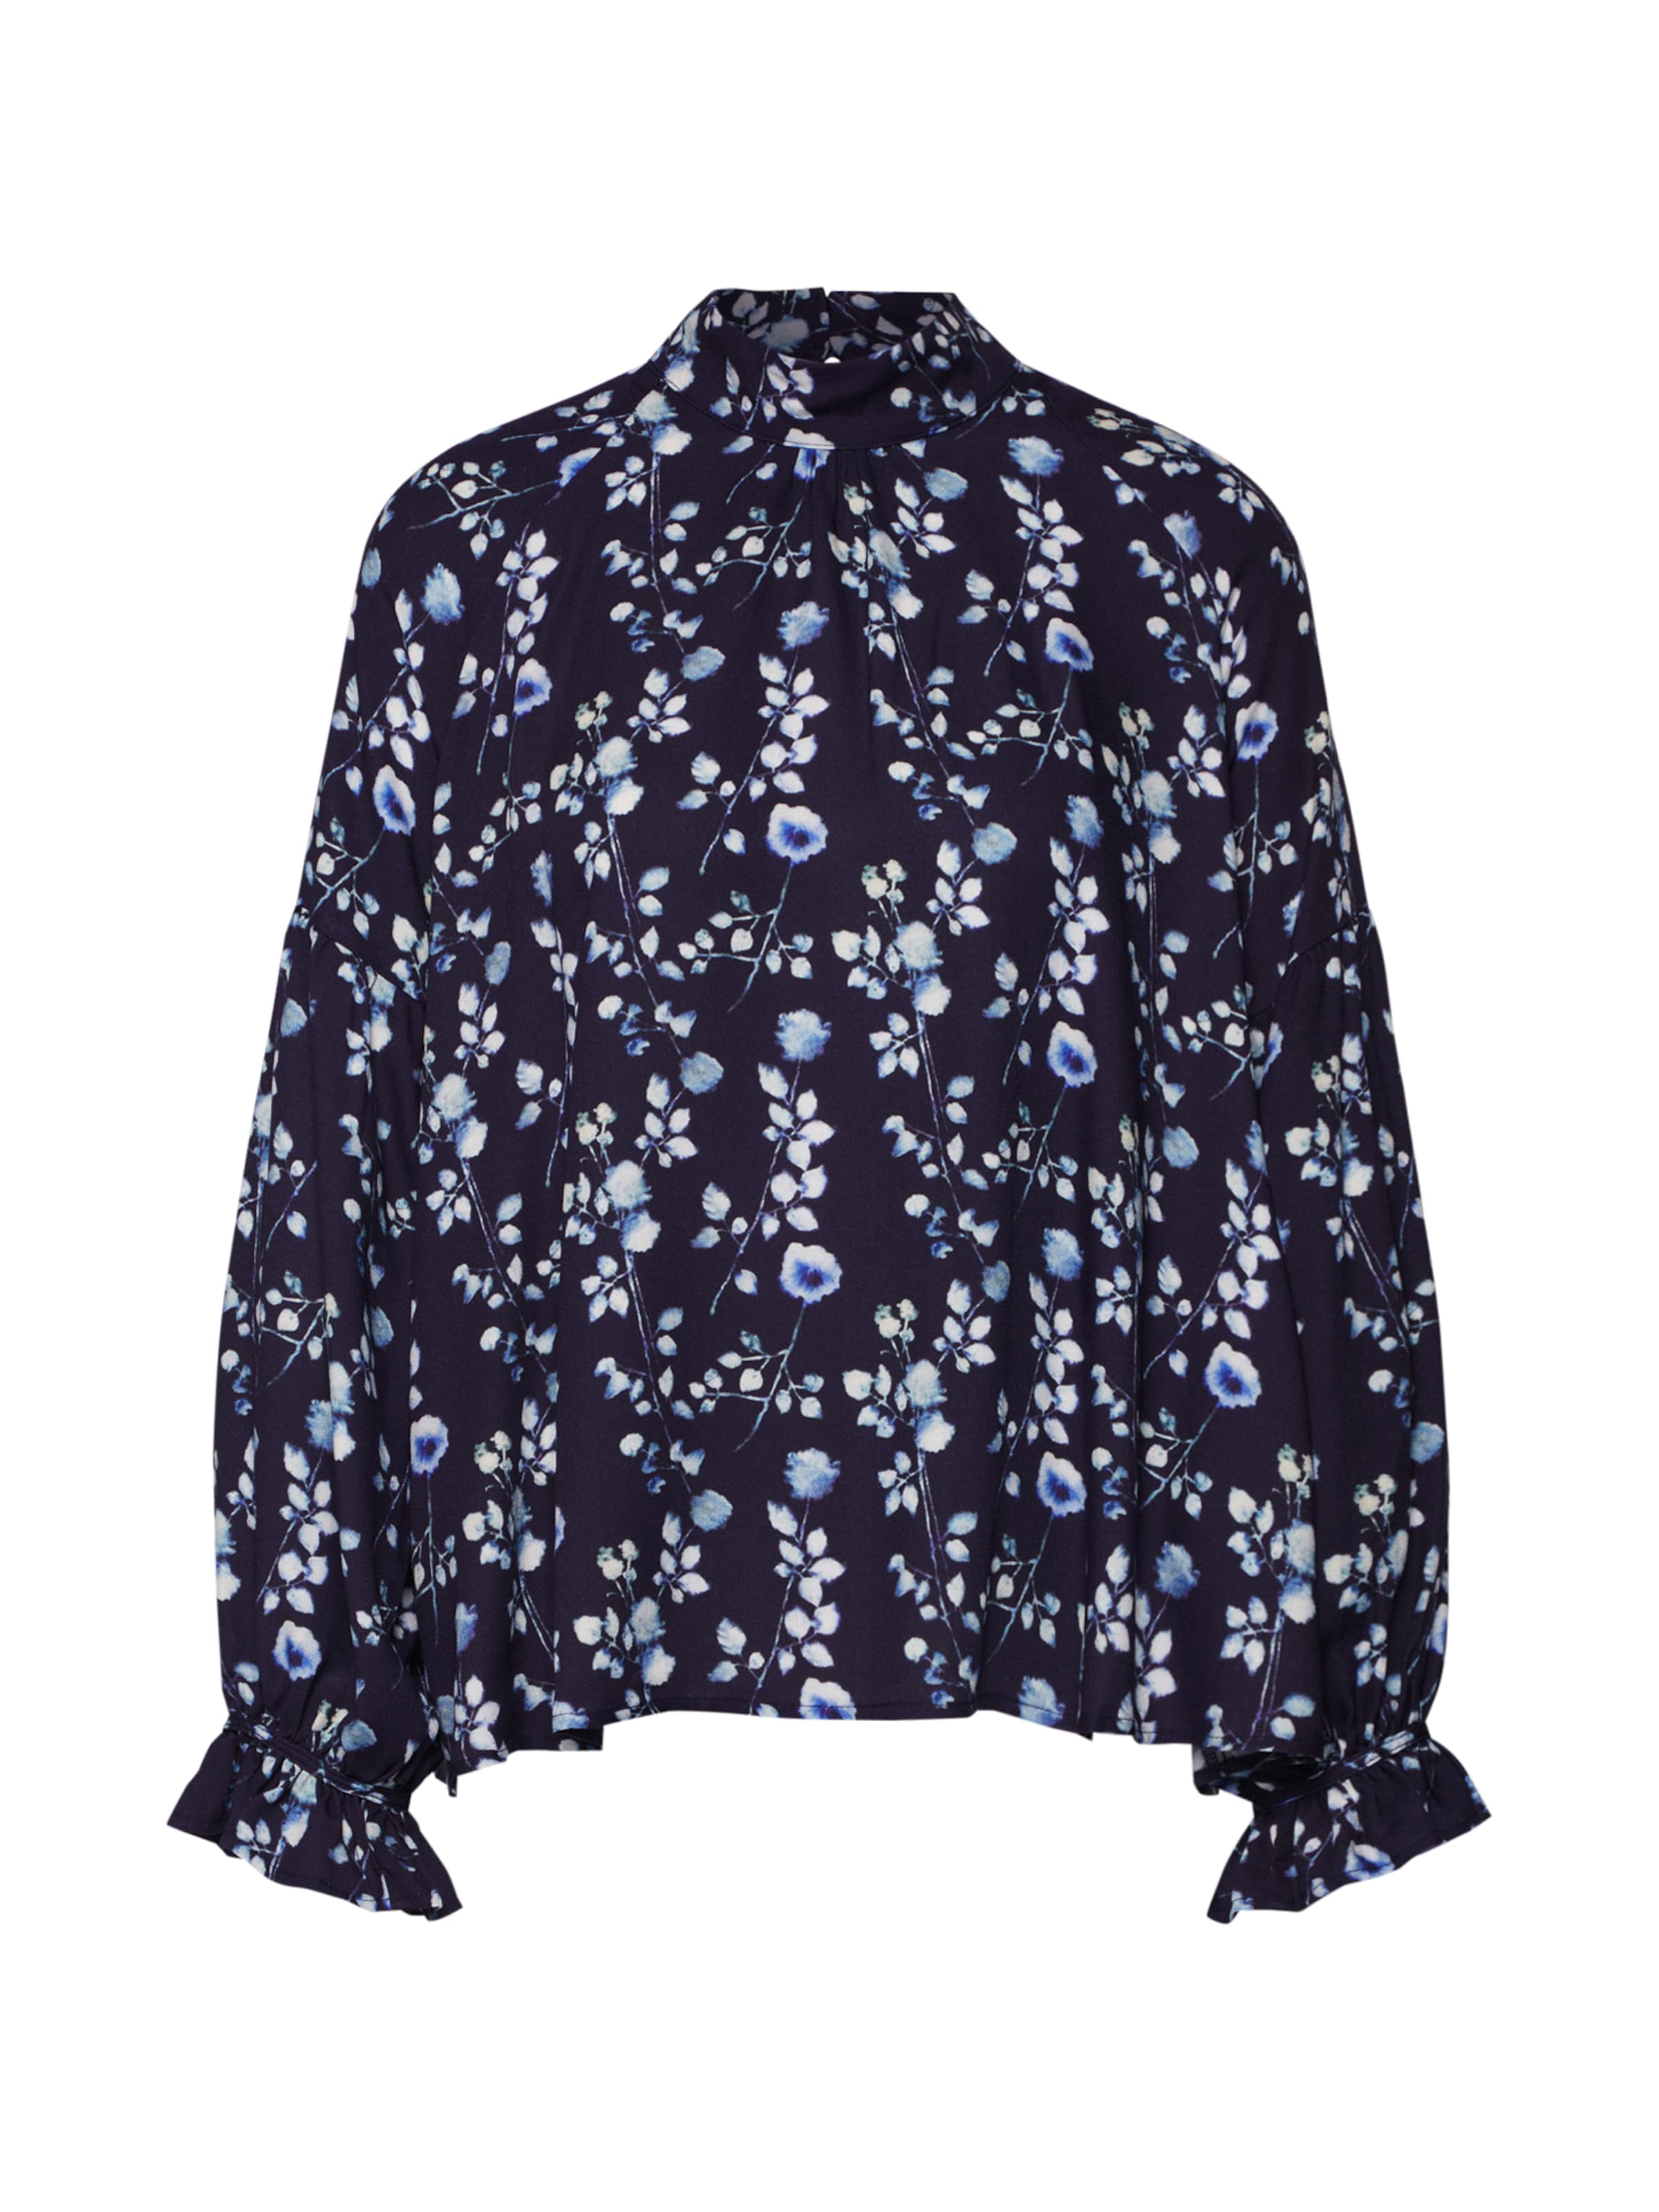 Blouse' 'printed Mavi In Blau Bluse oCxerWdB